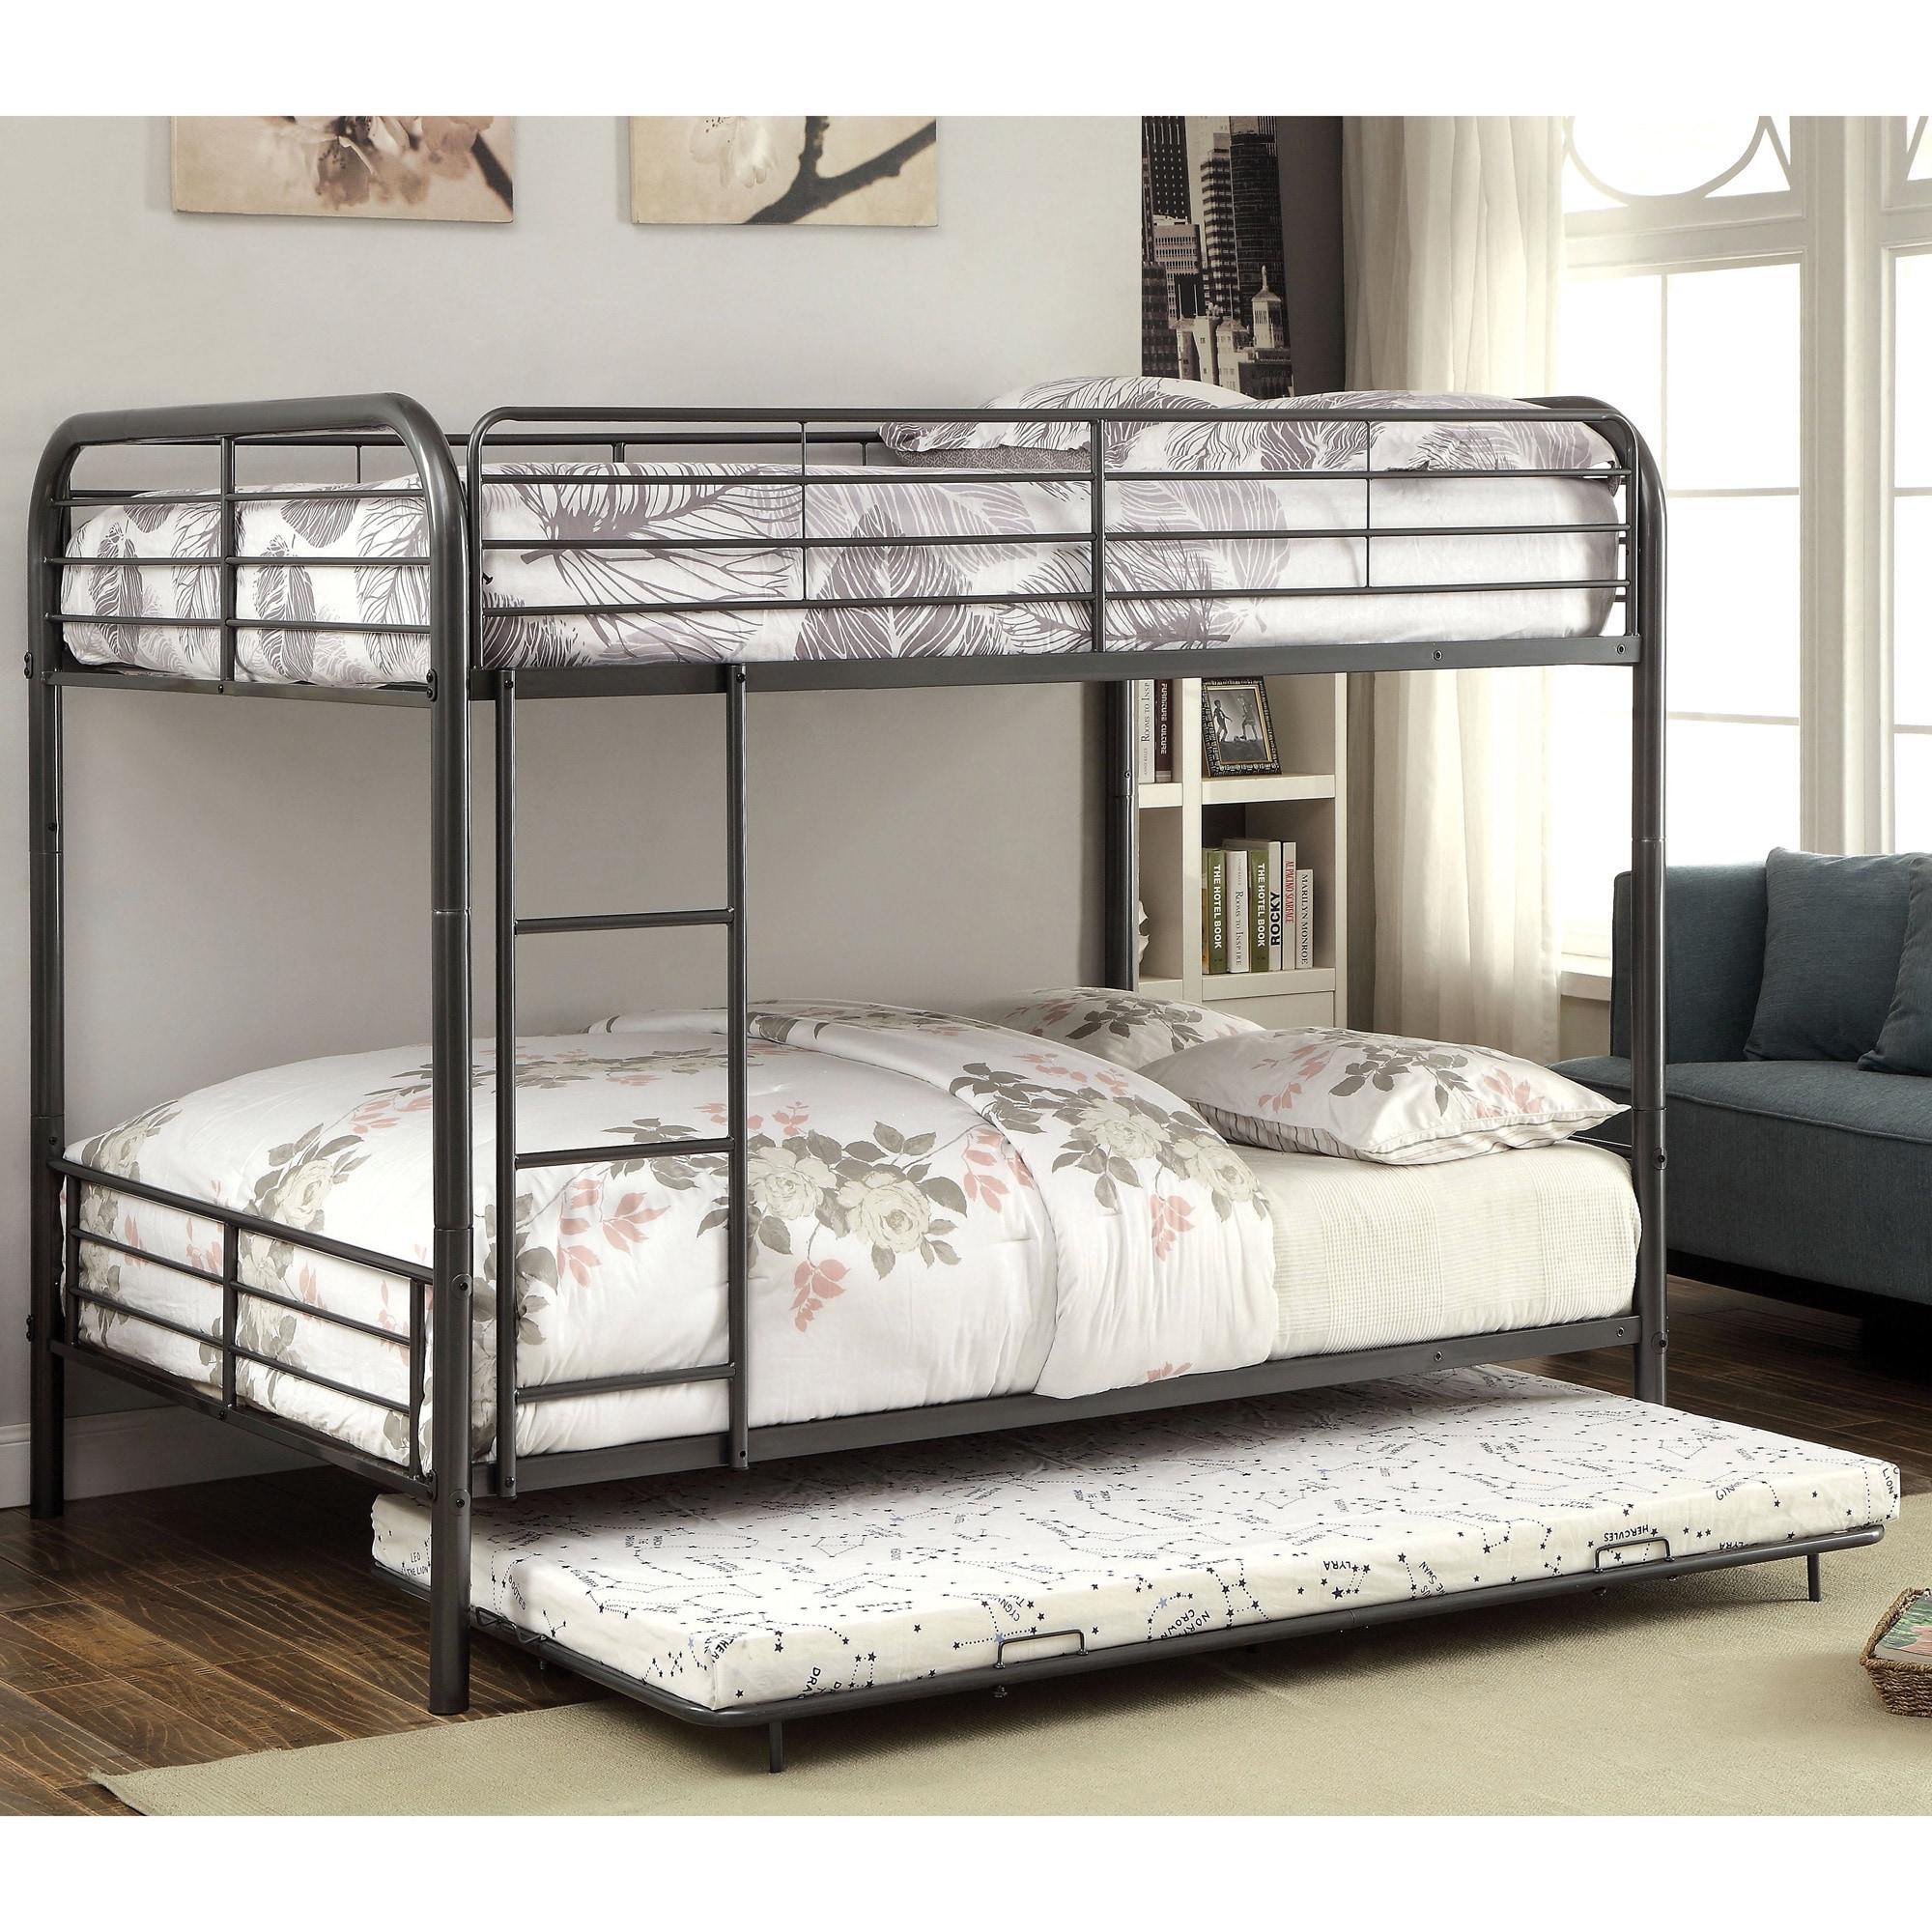 Attractive Furniture of America Linden II 2-piece Full Over Full Metal Bunk  WC38